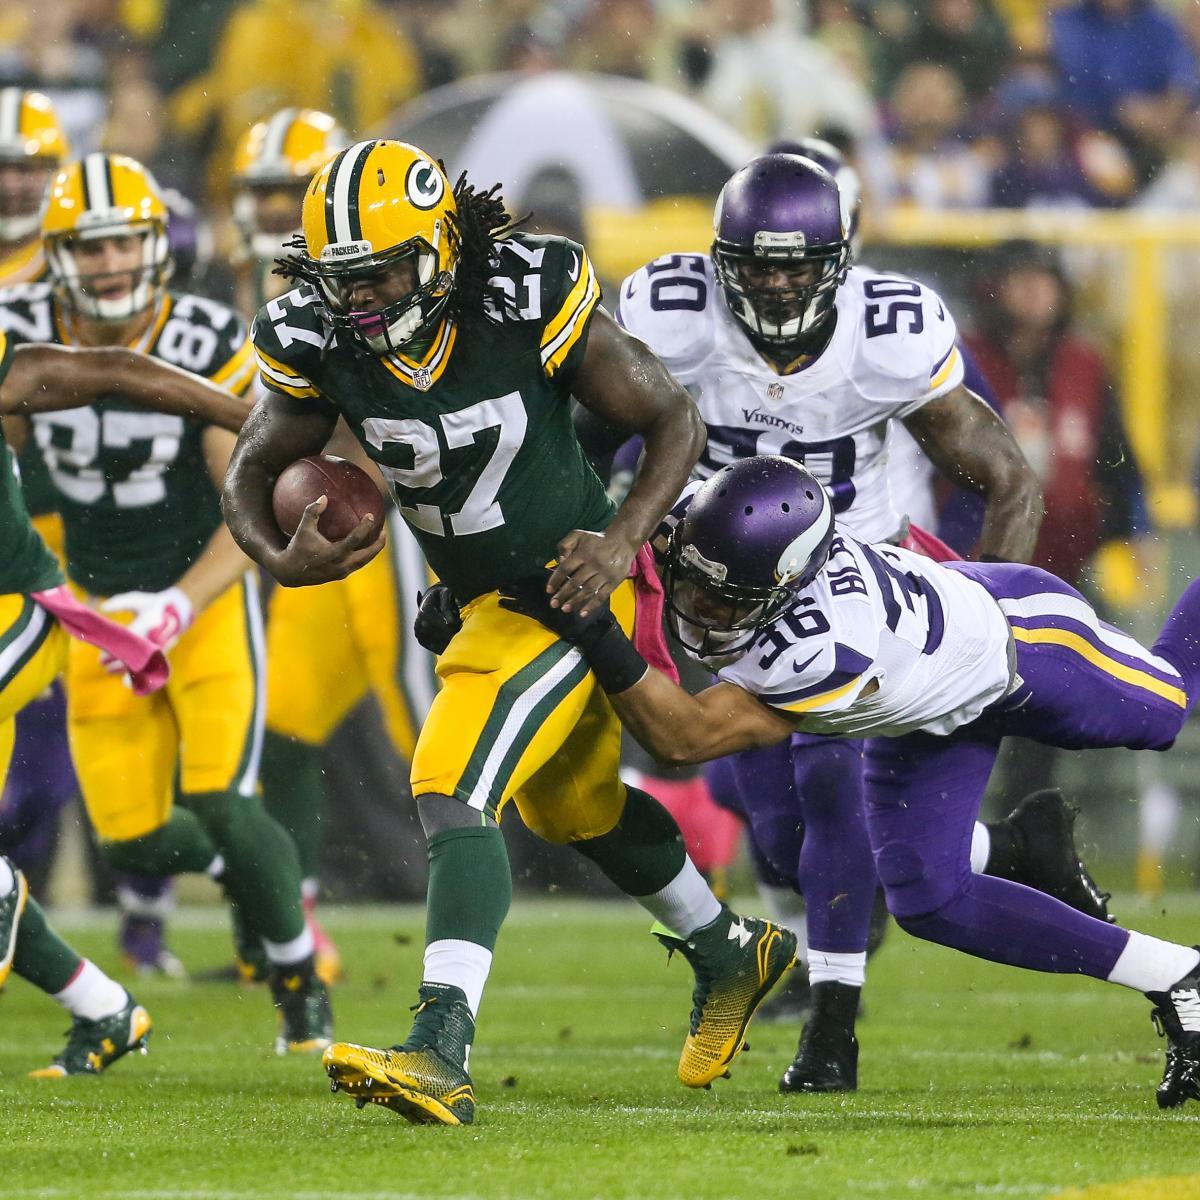 Minnesota Vikings vs. Green Bay Packers: Live Score and ...